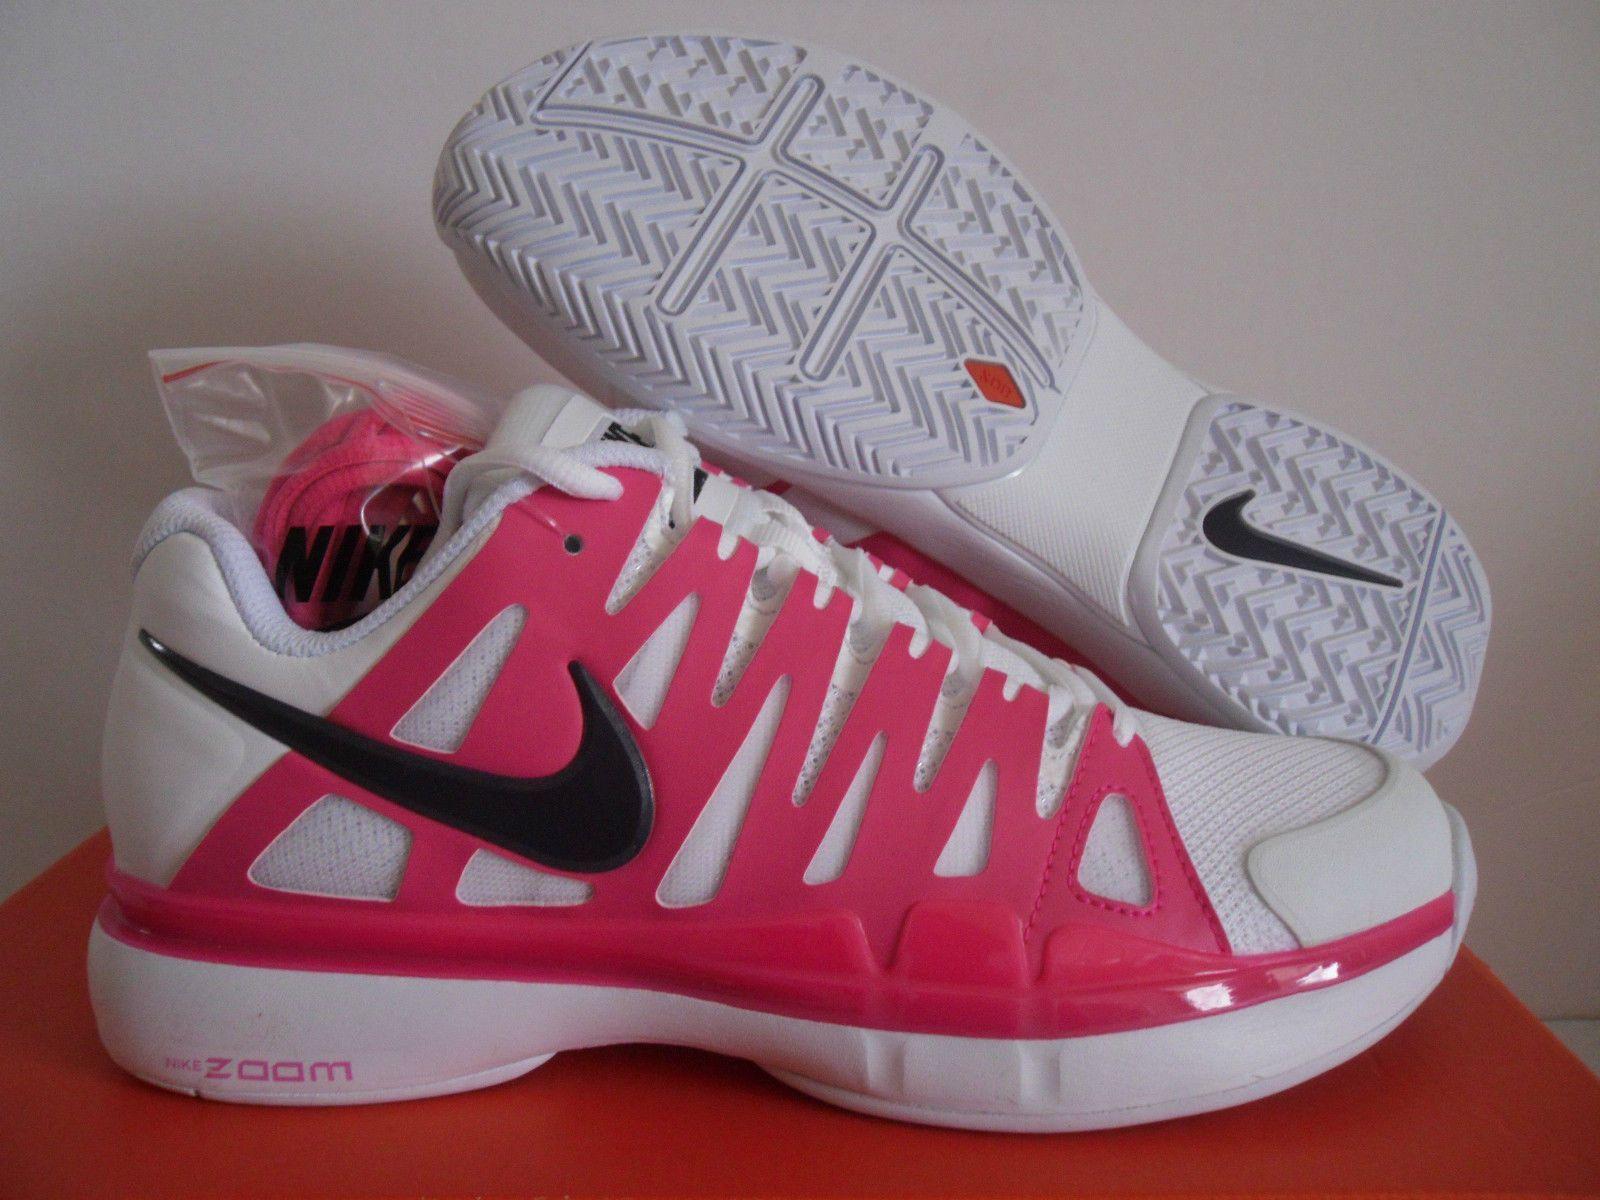 Nueva Nike Mujer Vapor 9 Tour Tour Tour Para Tenis blancoo   rosado   Morado 543222-156   alto descuento